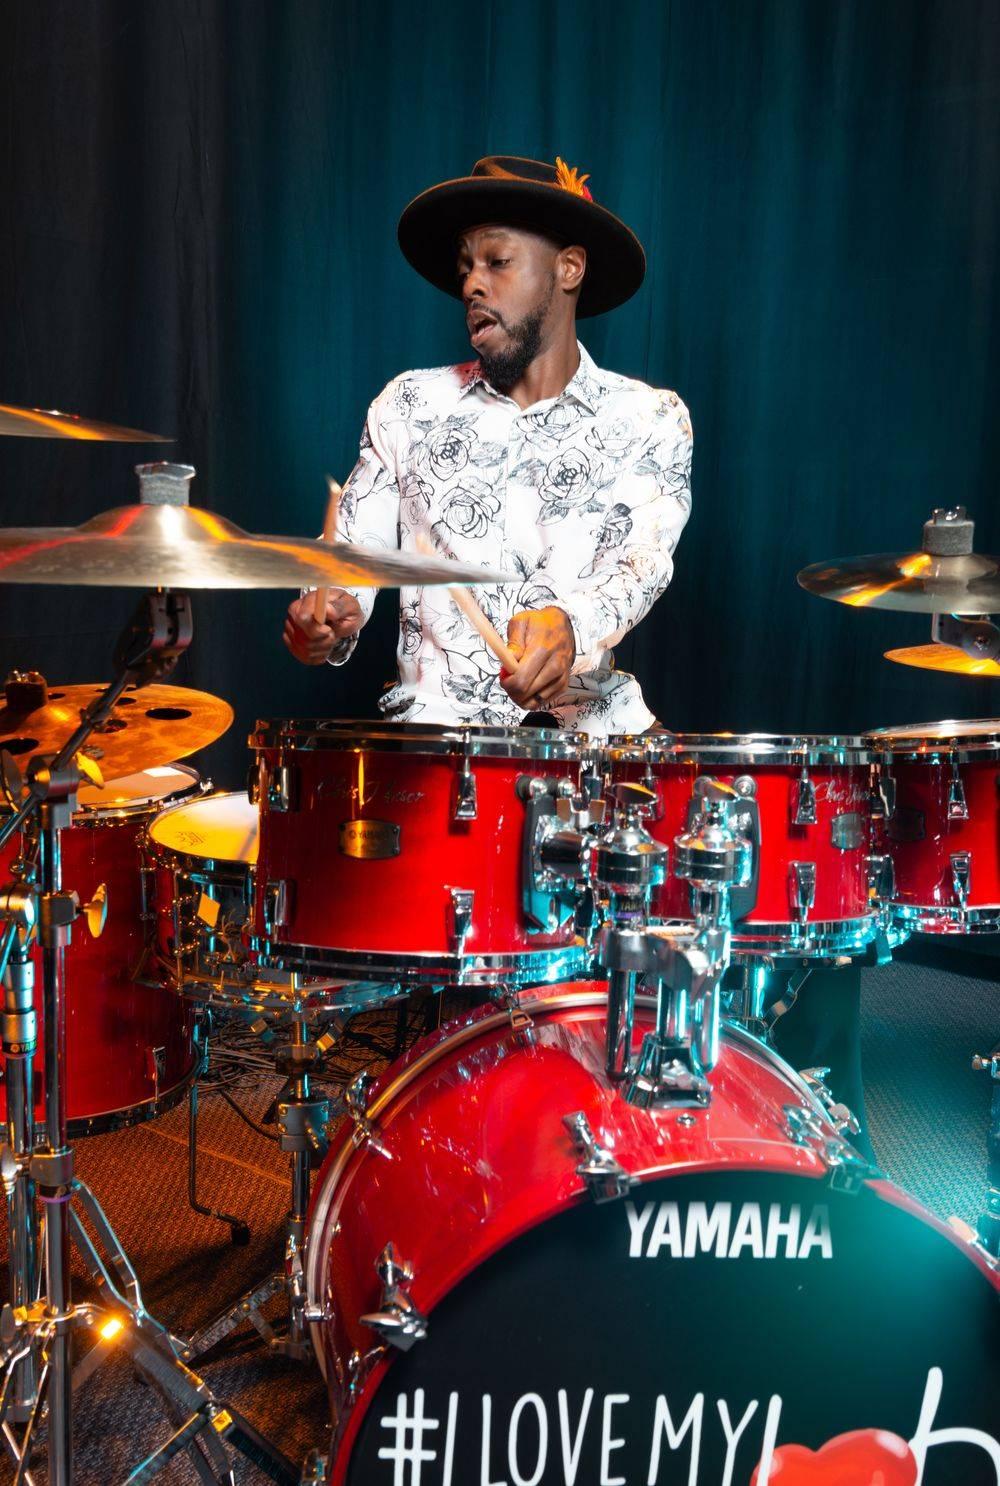 Drummer for Lady Gaga, Snoop Dog, Stevie Wonder